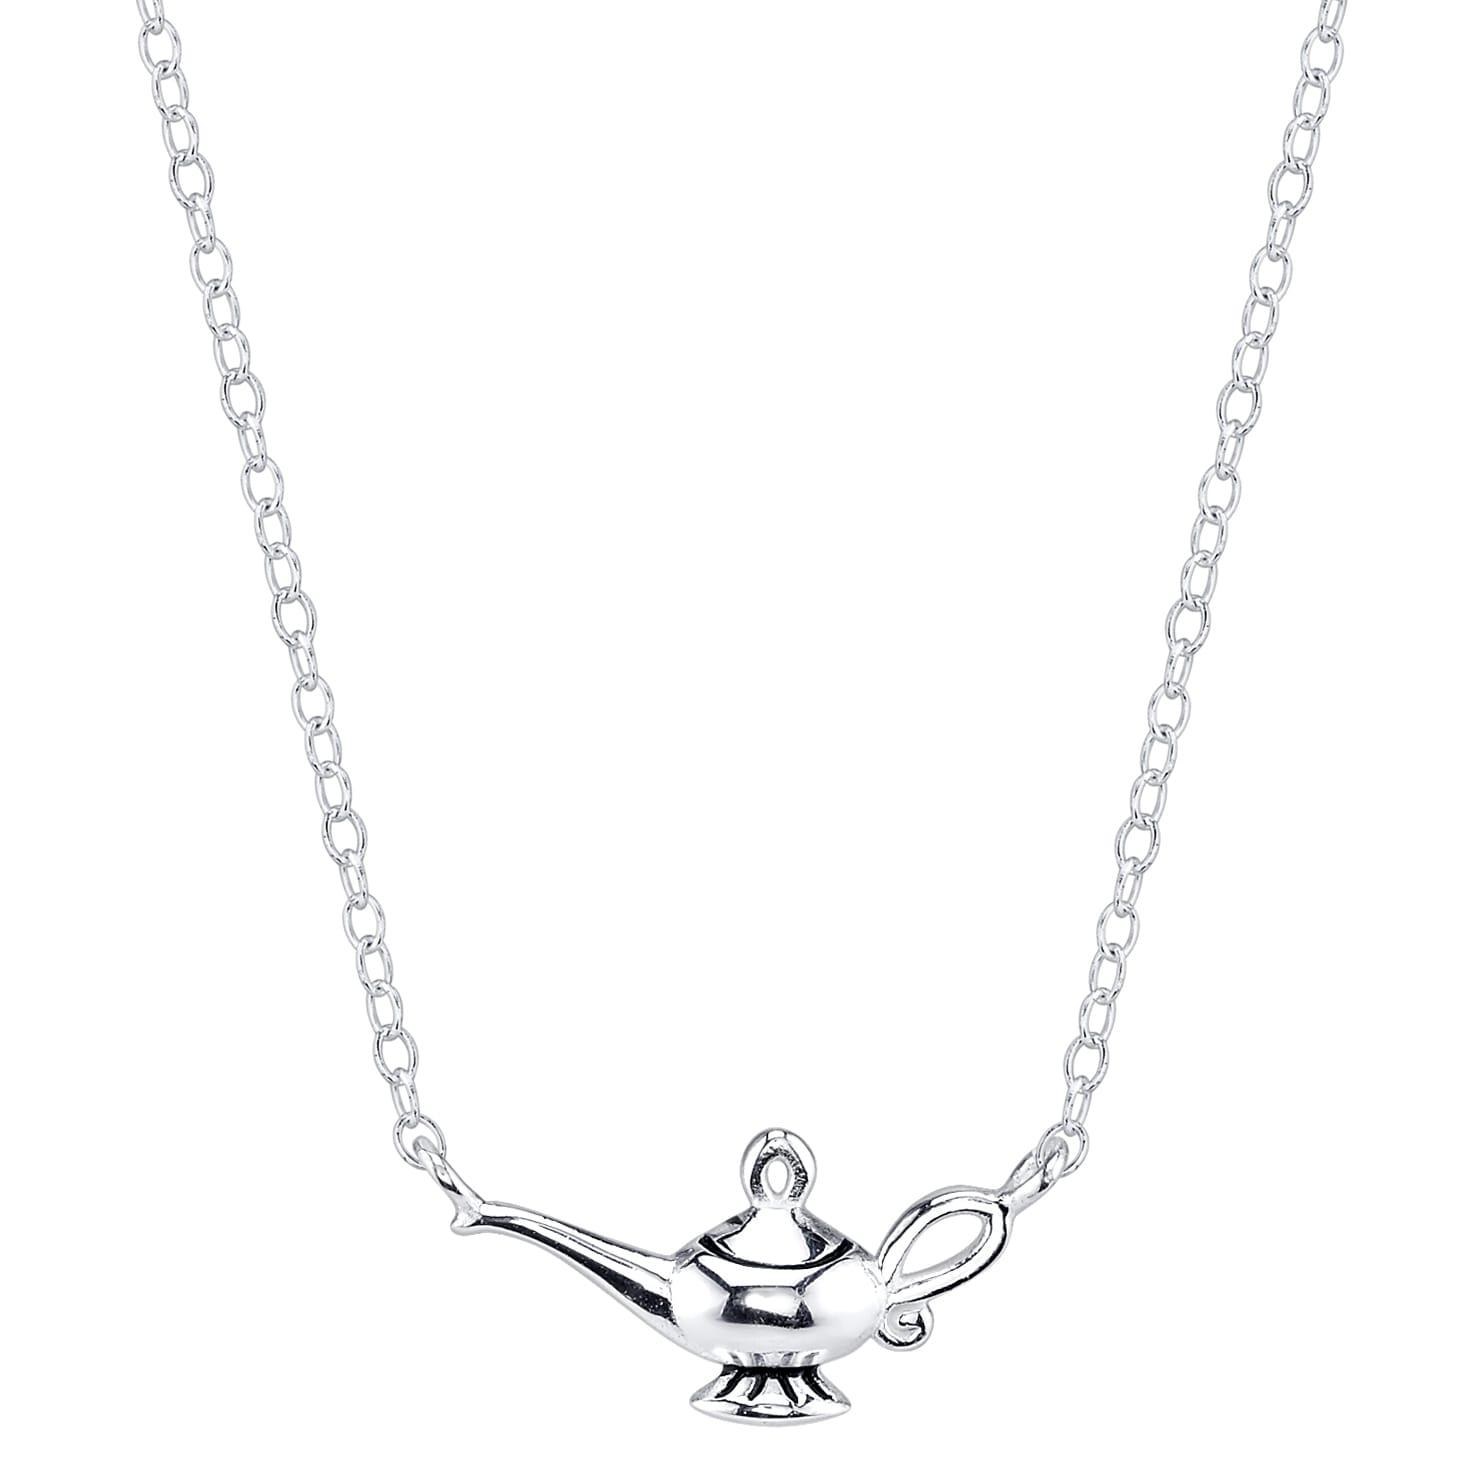 Disney Sterling Silver Aladdin Magic Lamp Necklace (Disne...